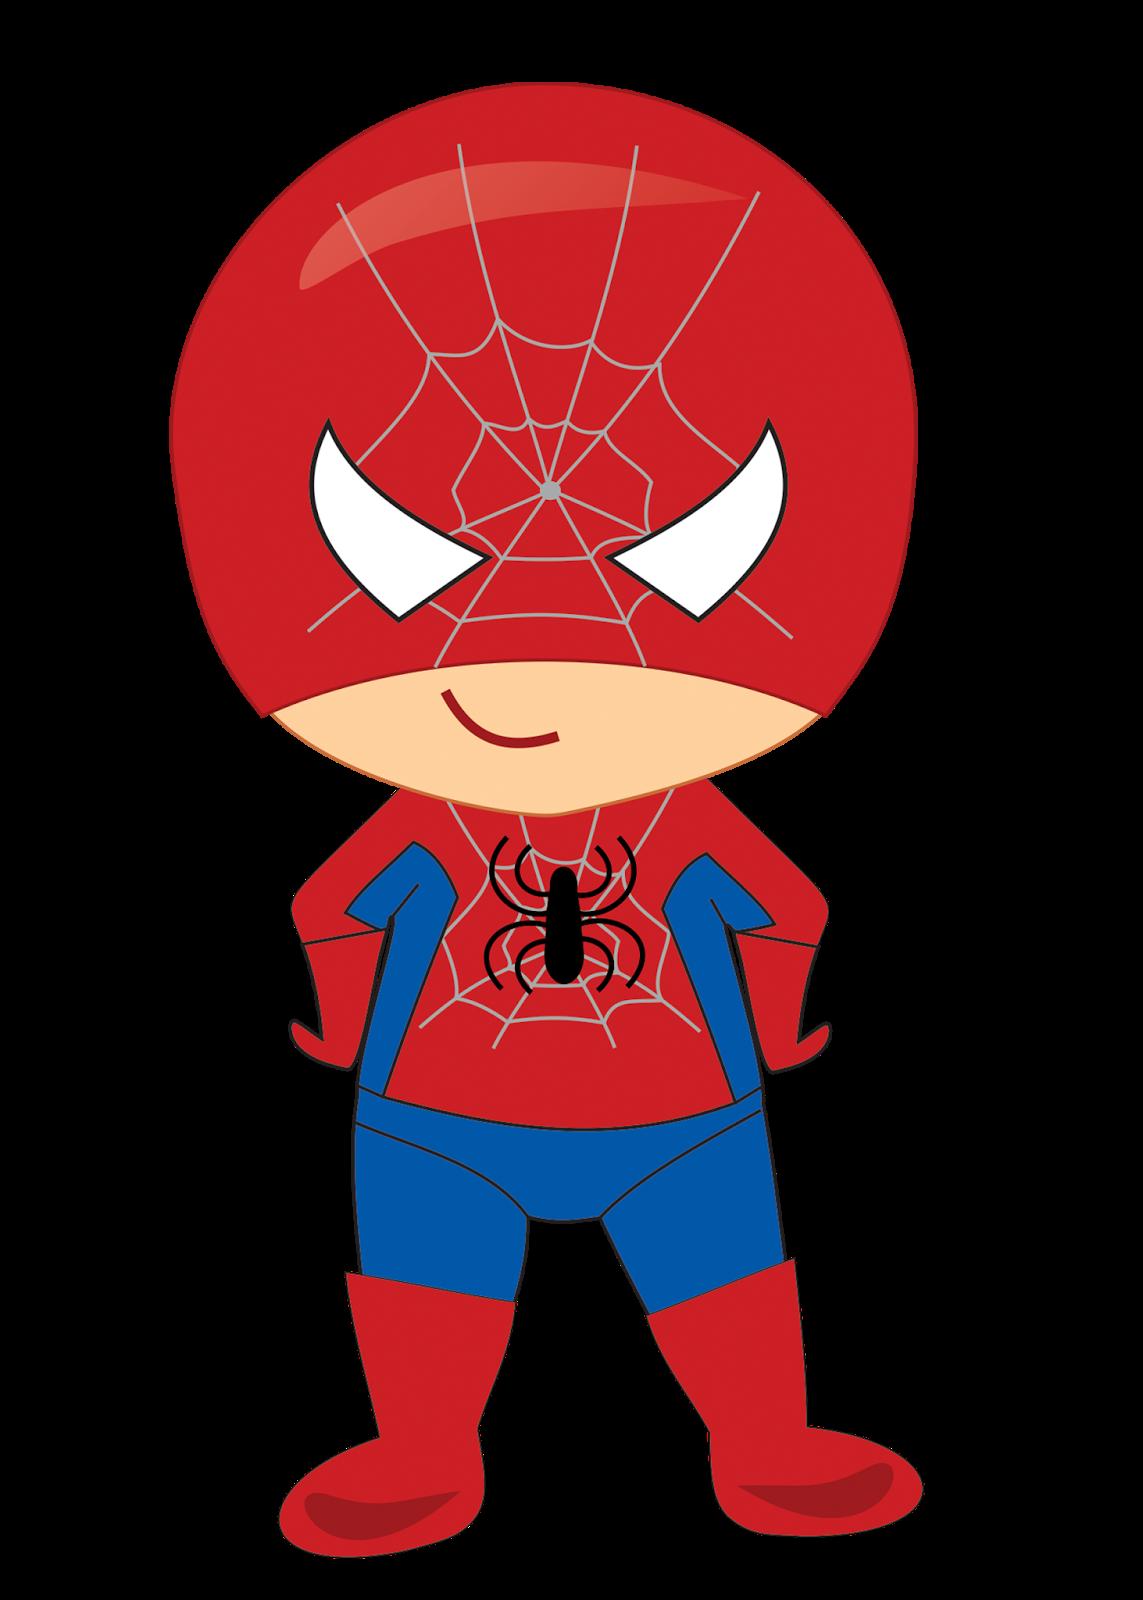 1143x1600 Baby Superheroes Clipart. Niver 4 Superheroes